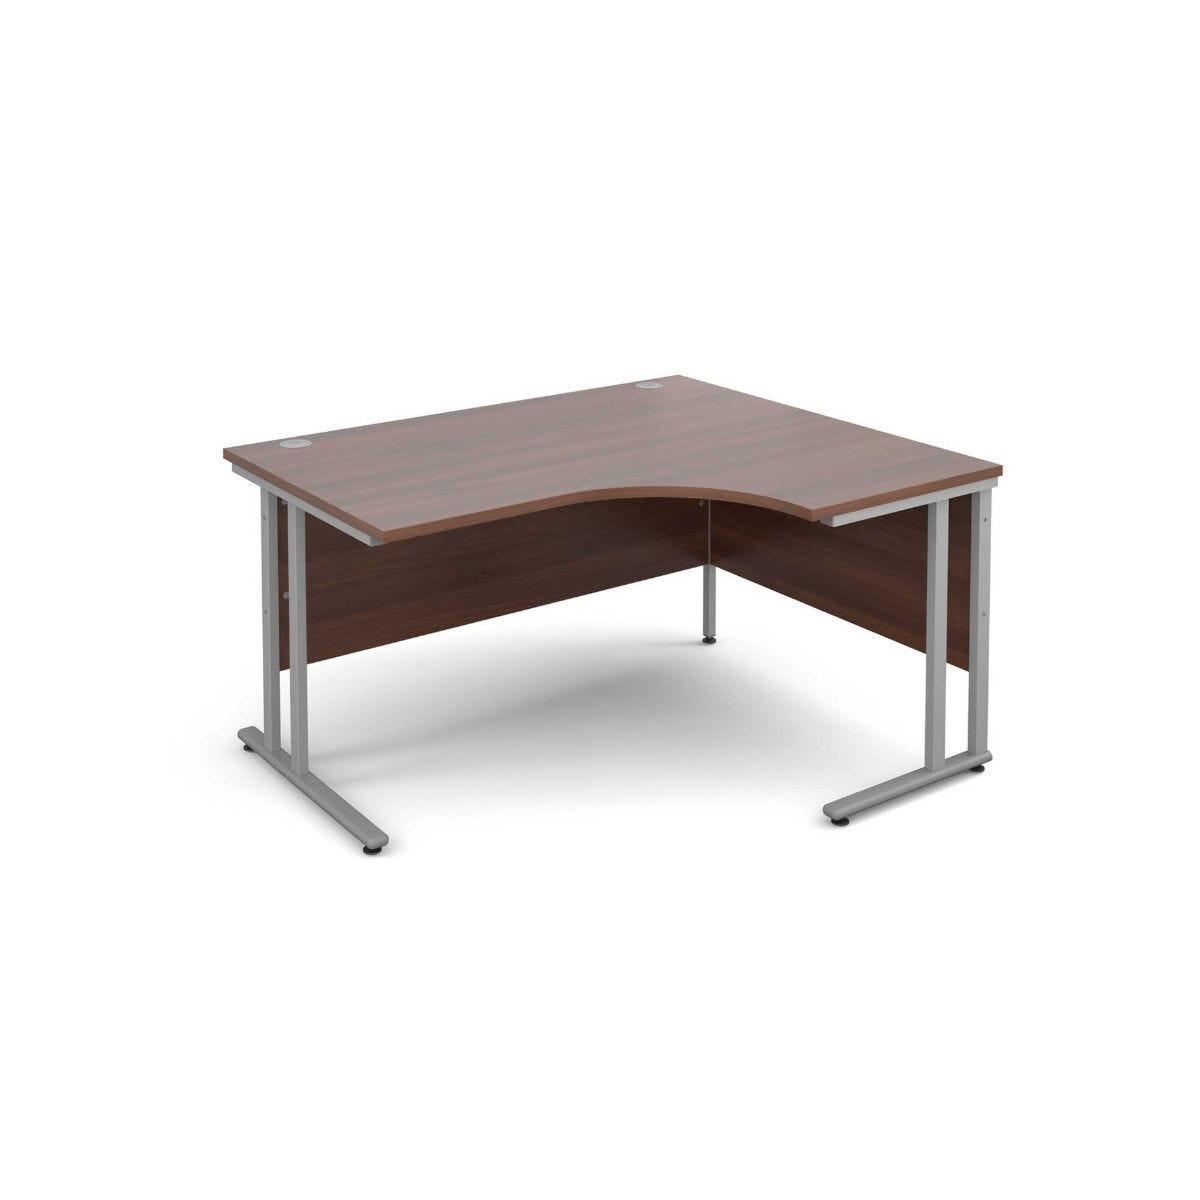 Maestro 25 Right Hand Ergonomic 1400 Desk with Silver Legs walnut